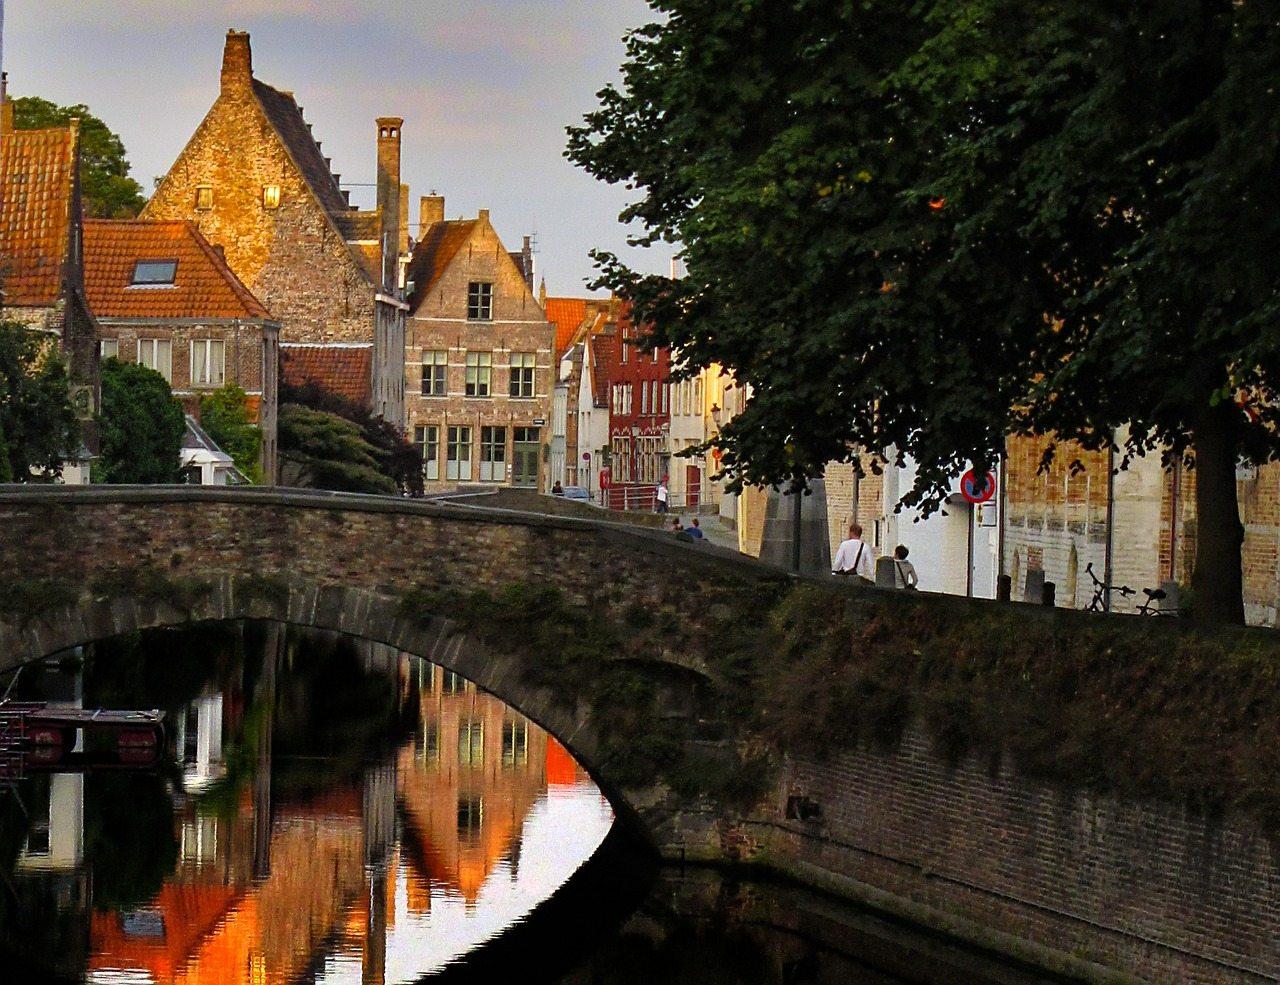 bruggy - belgicko